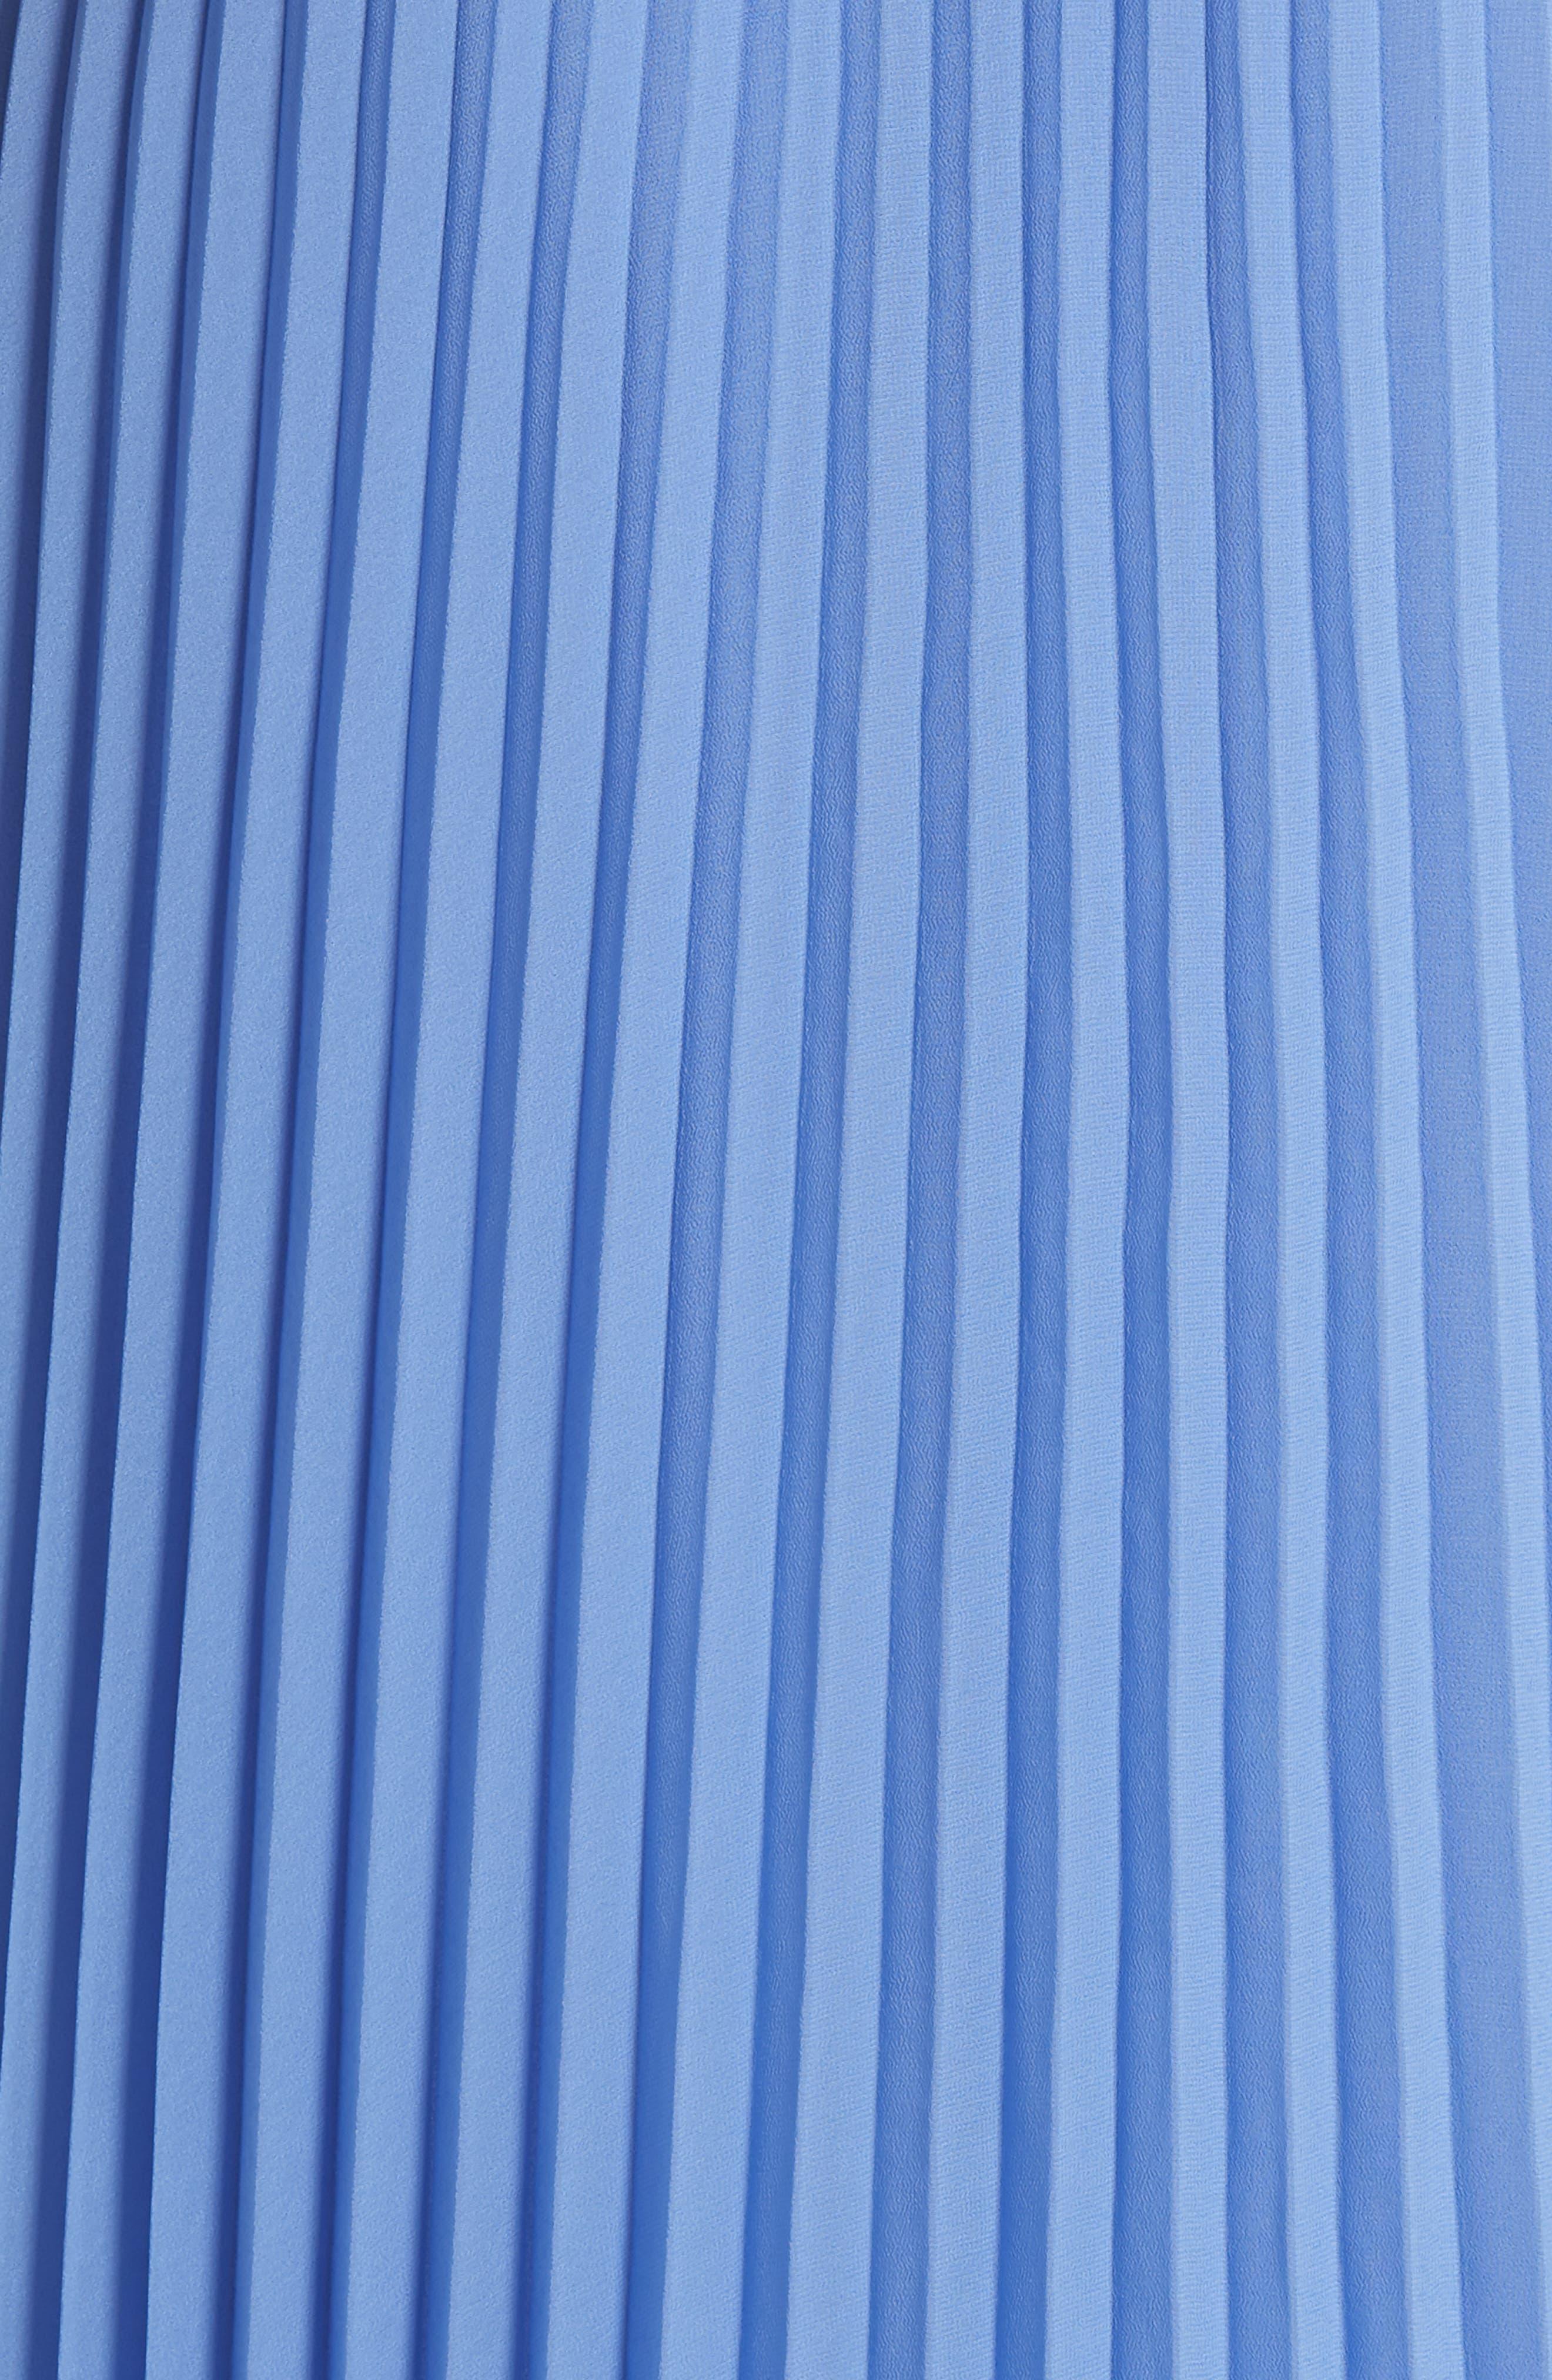 Pleat Midi Skirt,                             Alternate thumbnail 5, color,                             BERMUDA BLUE